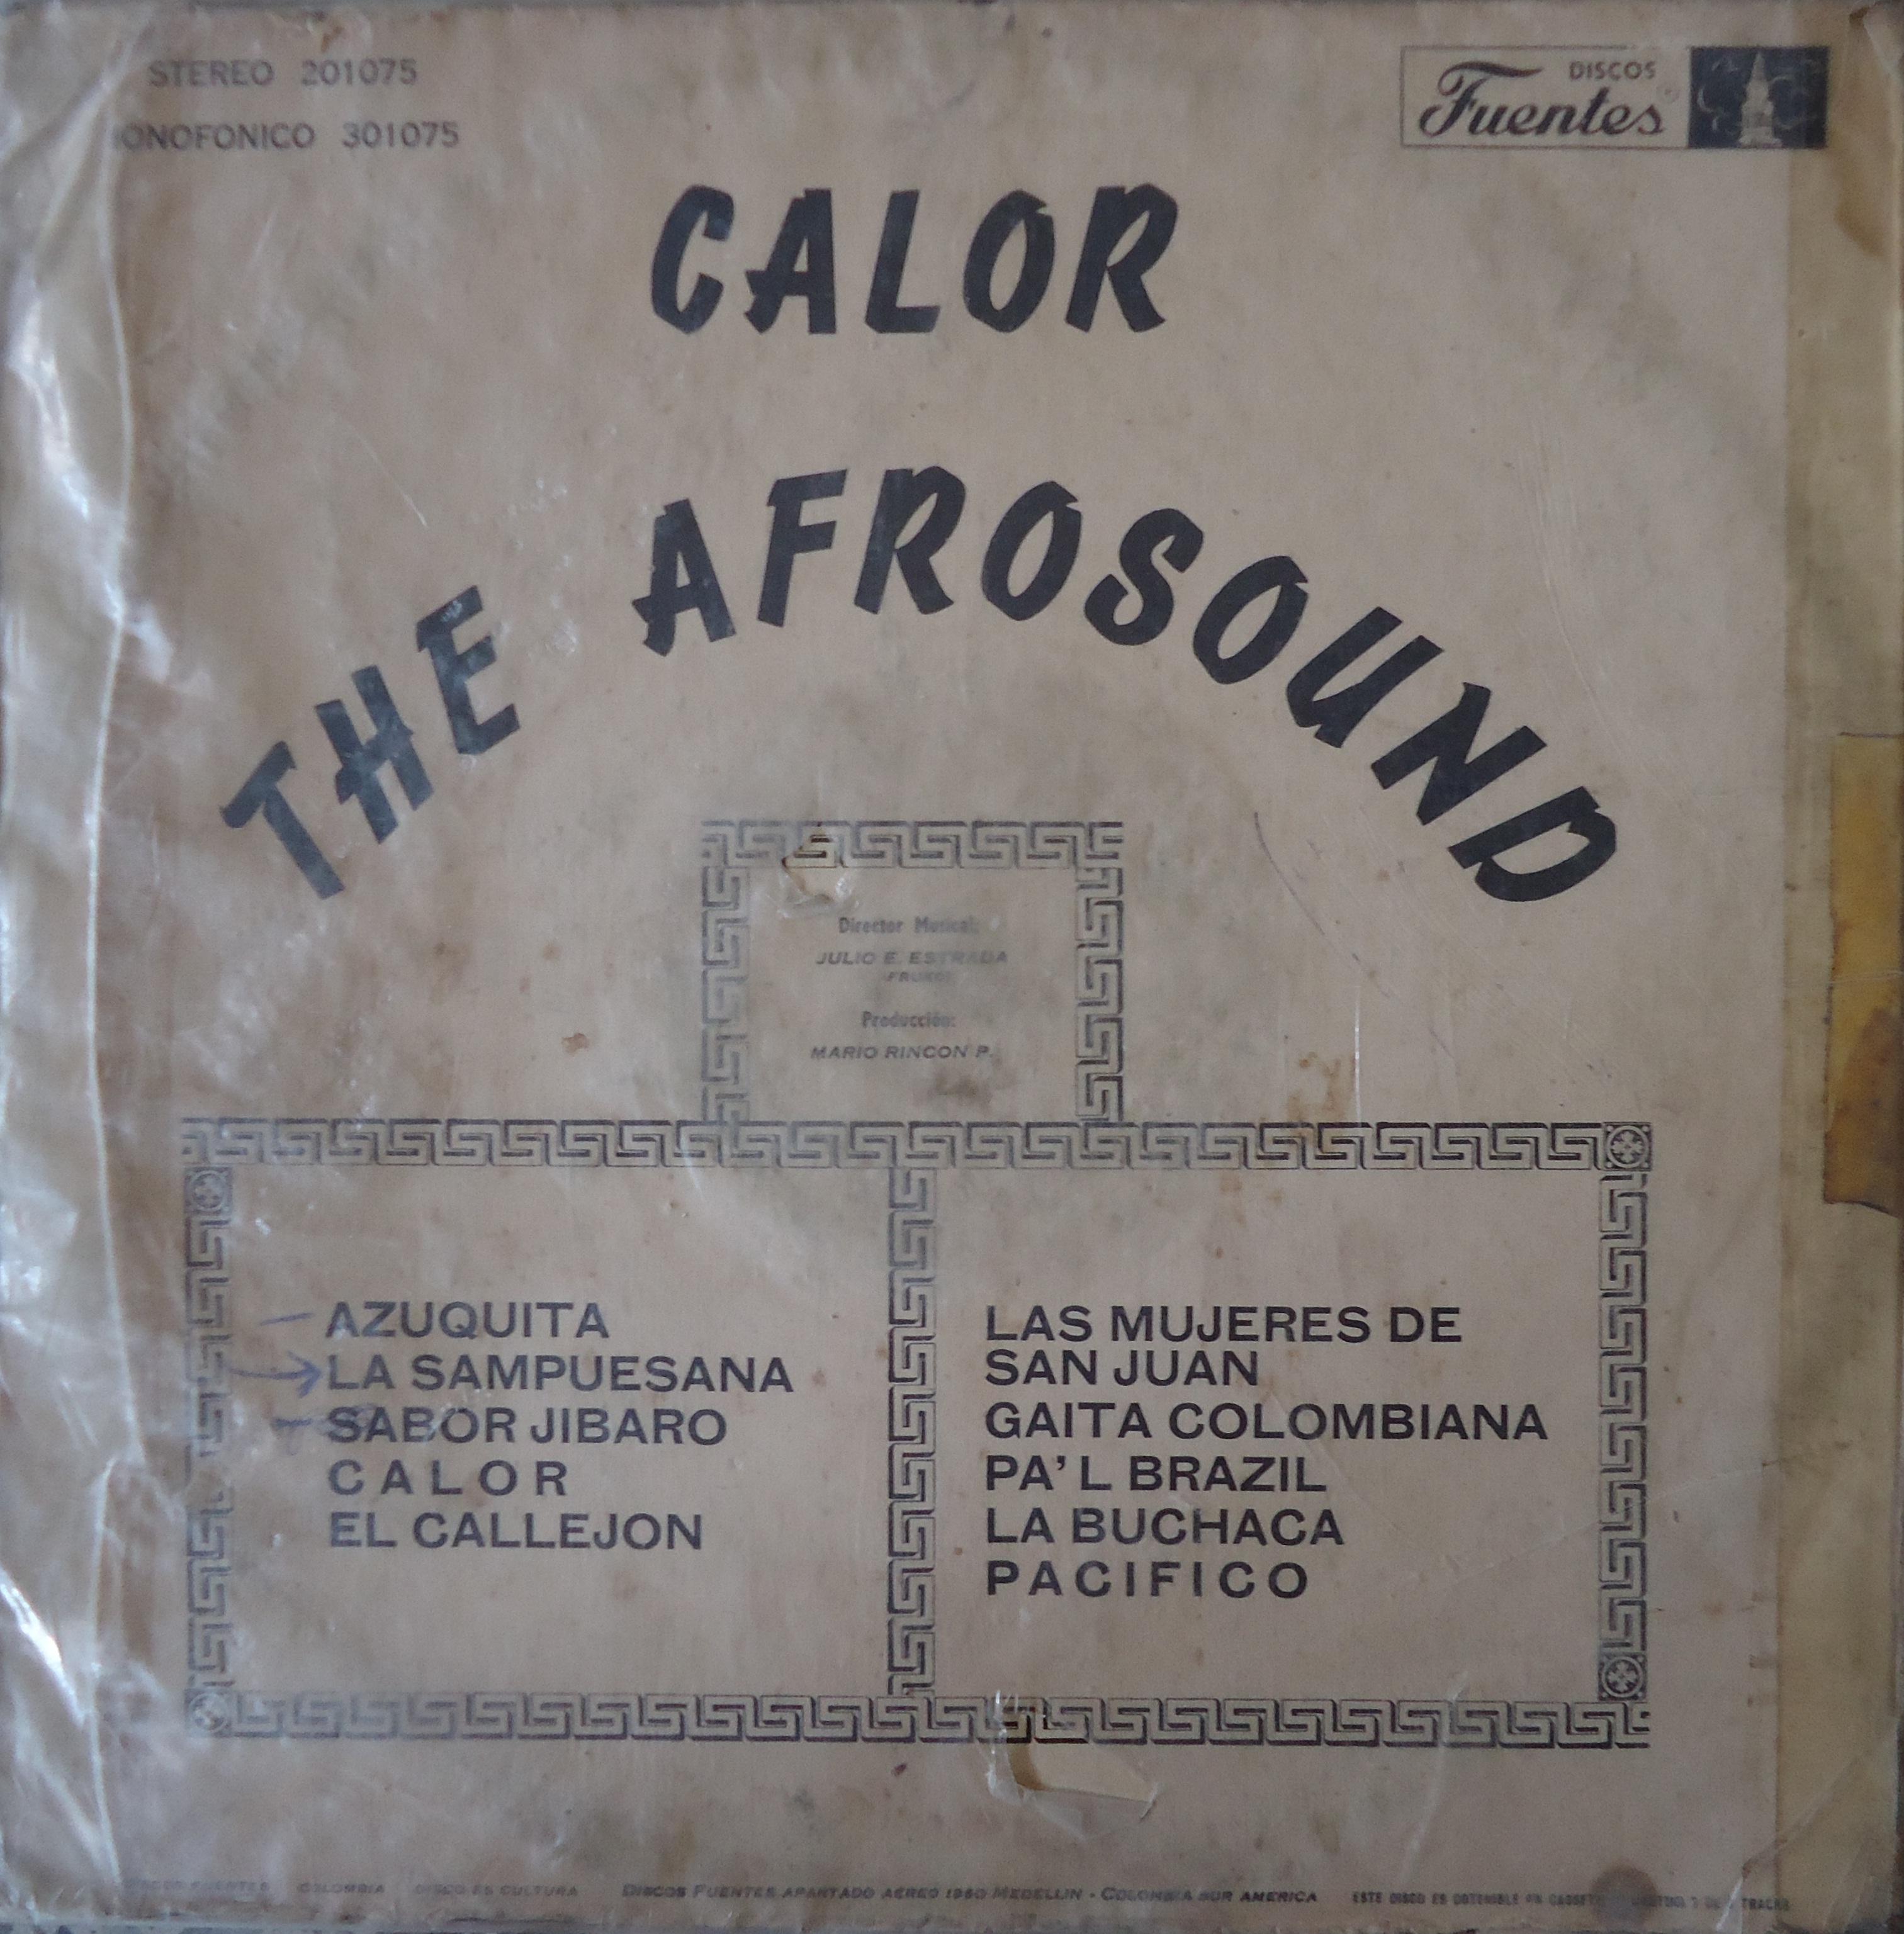 Afrosound Calor